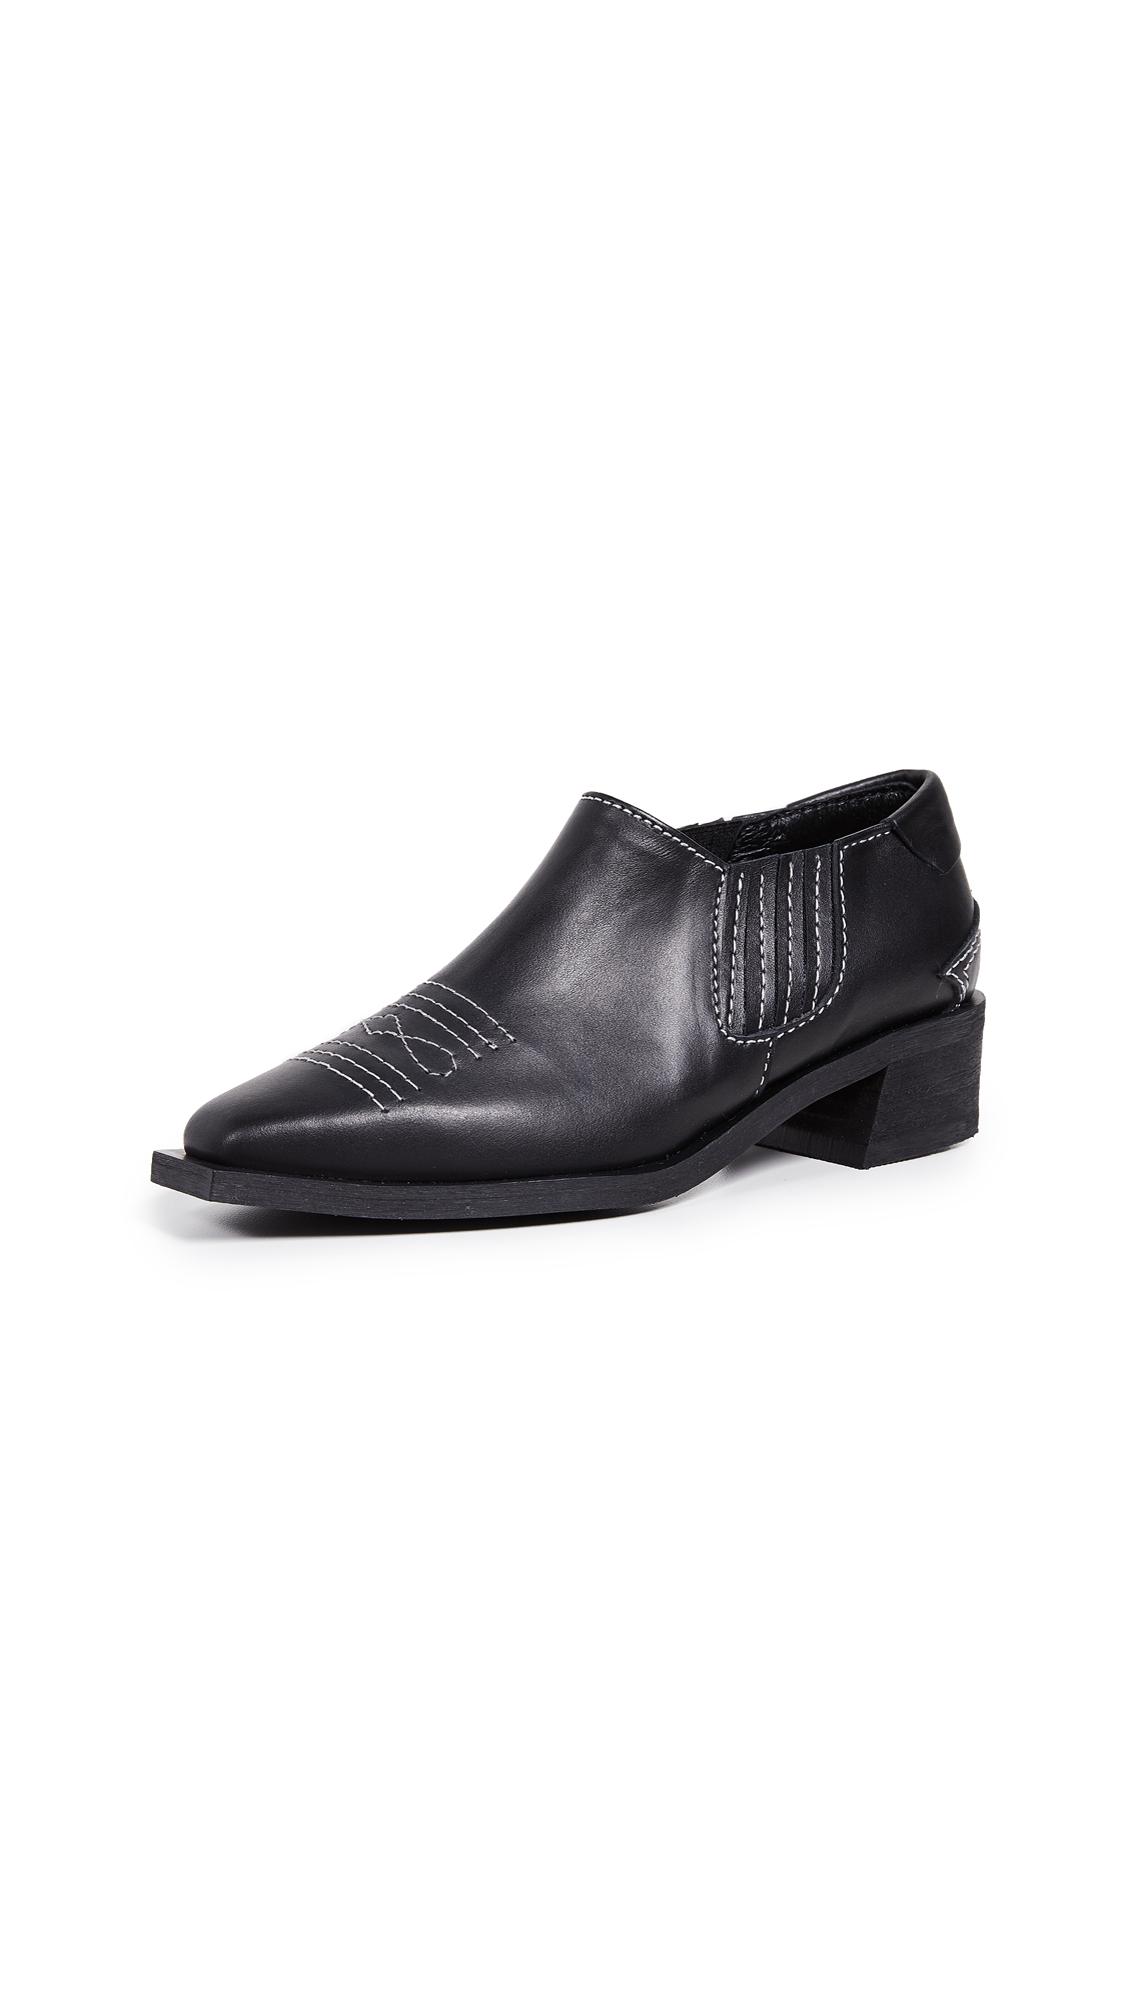 Reike Nen Western Shootie Boots - Black